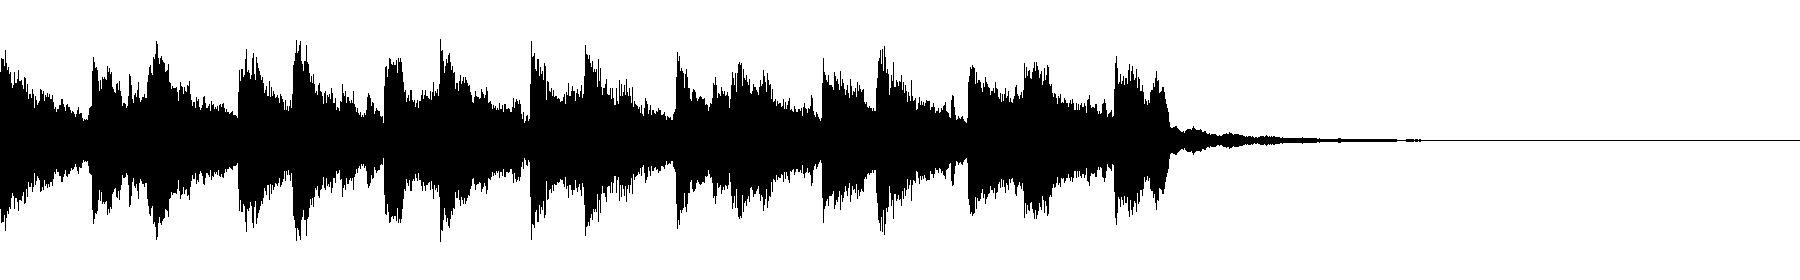 lofi 84bpm